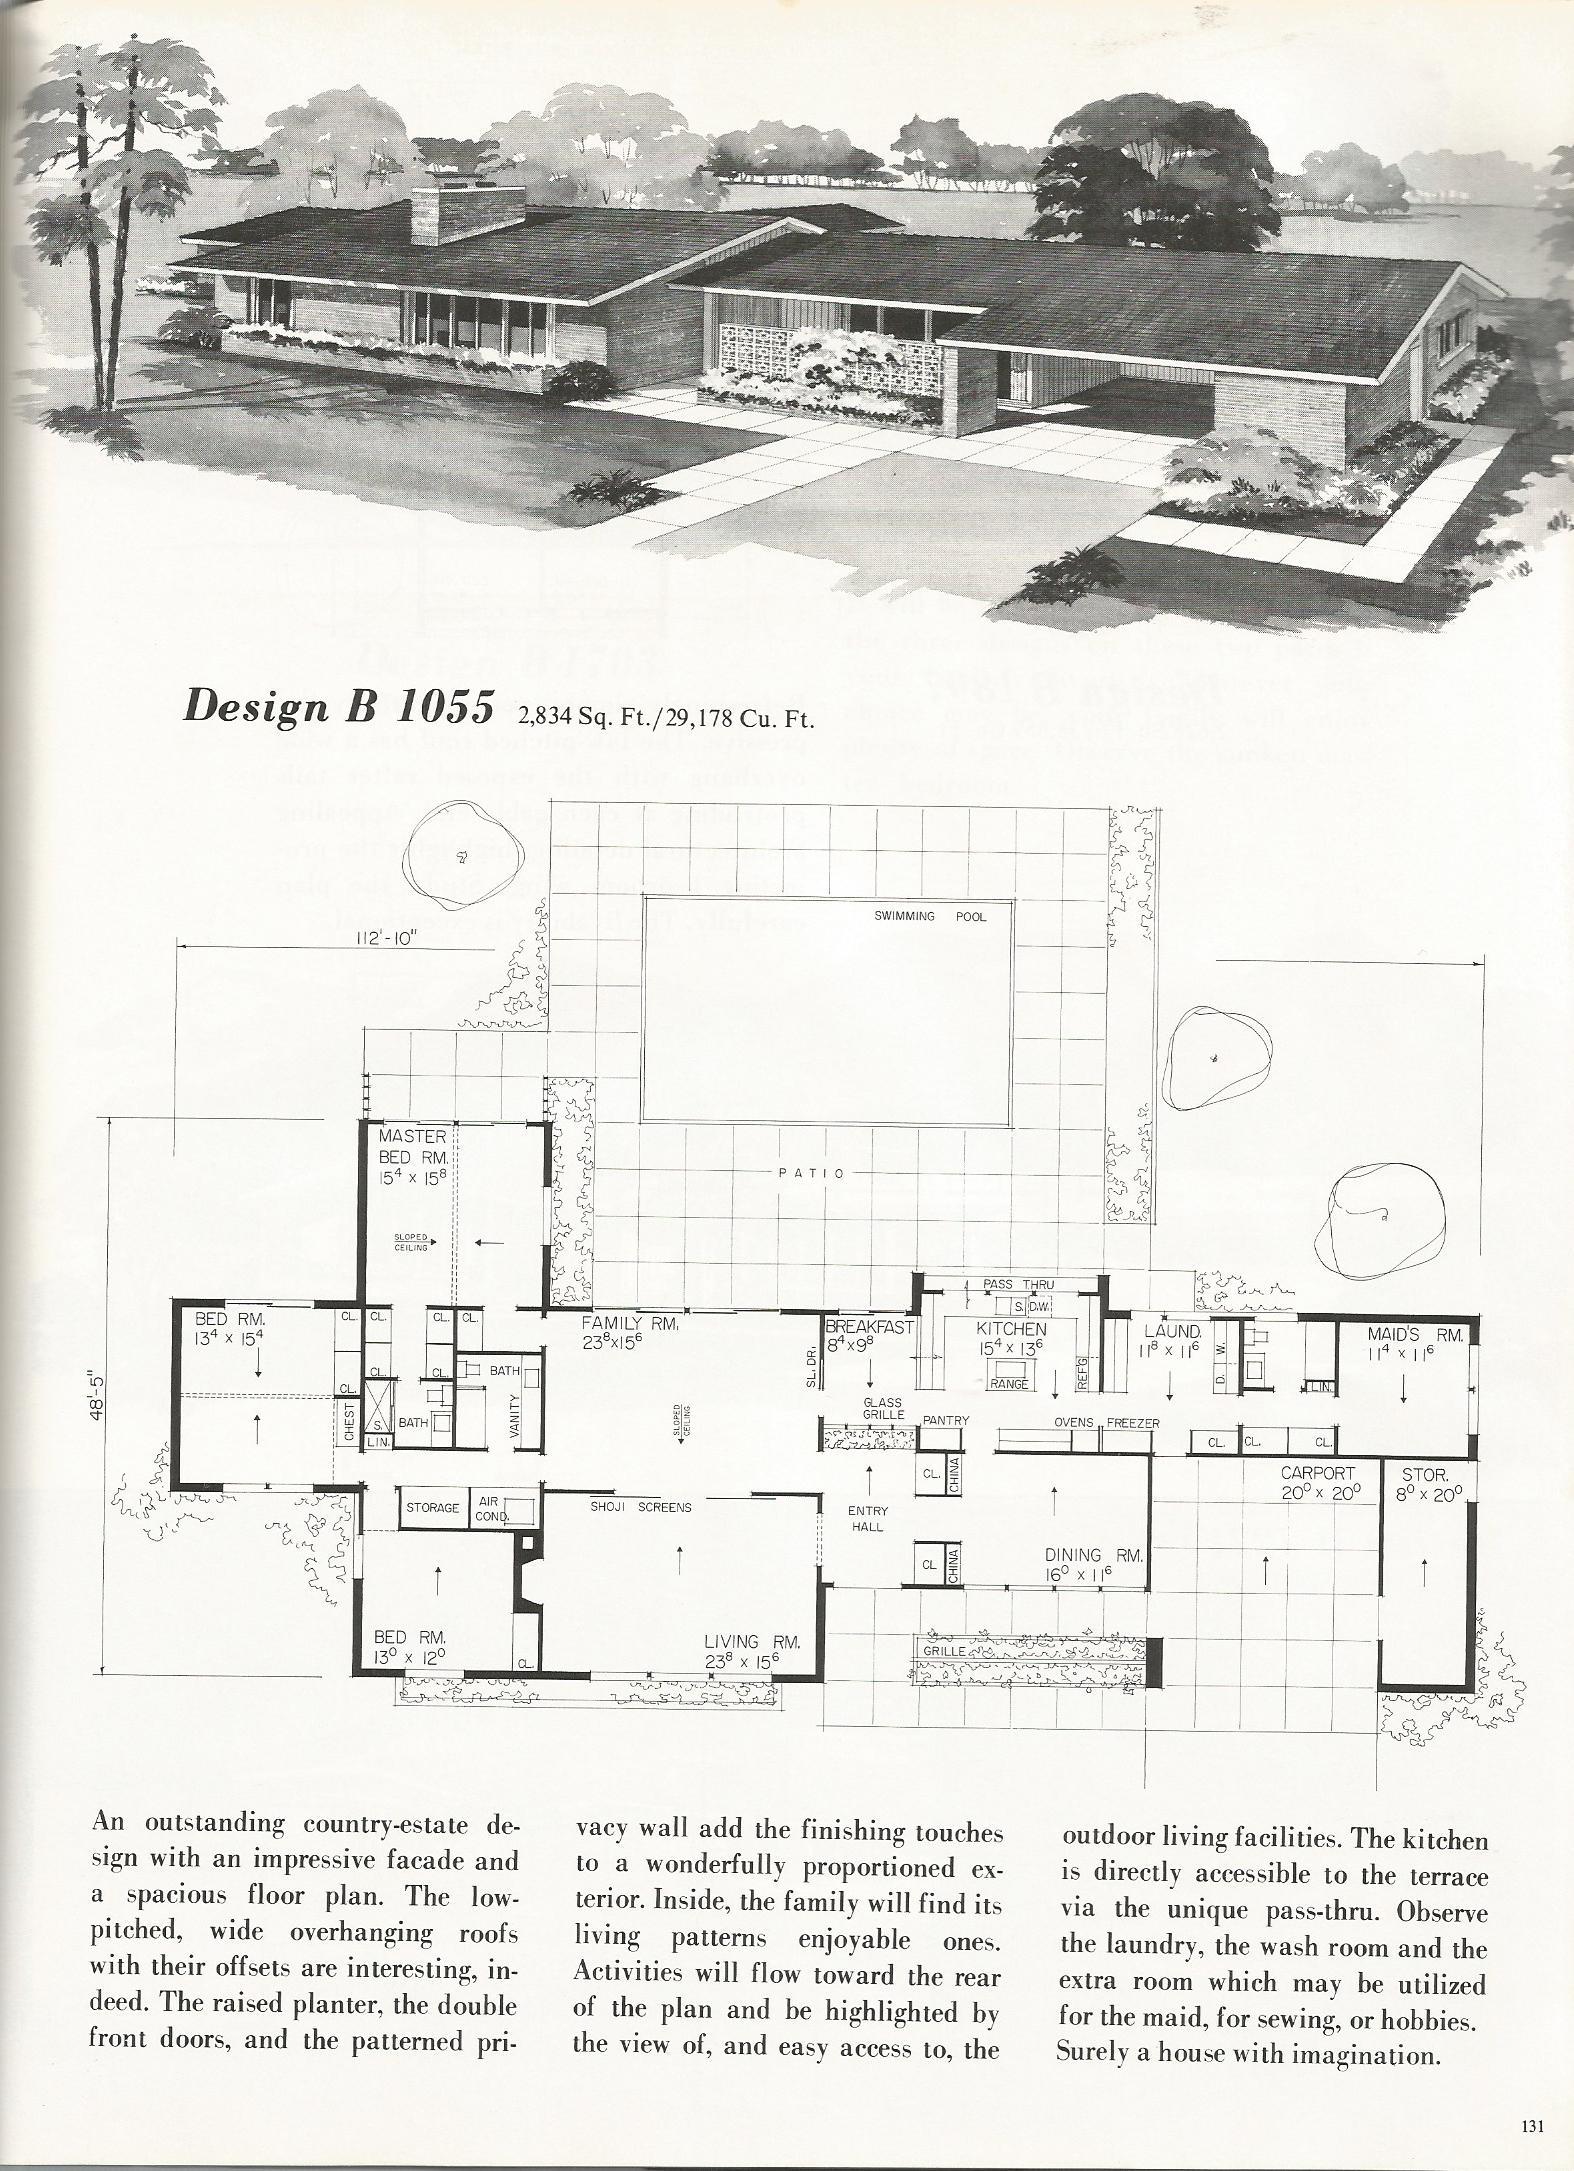 vintage house plans 1055